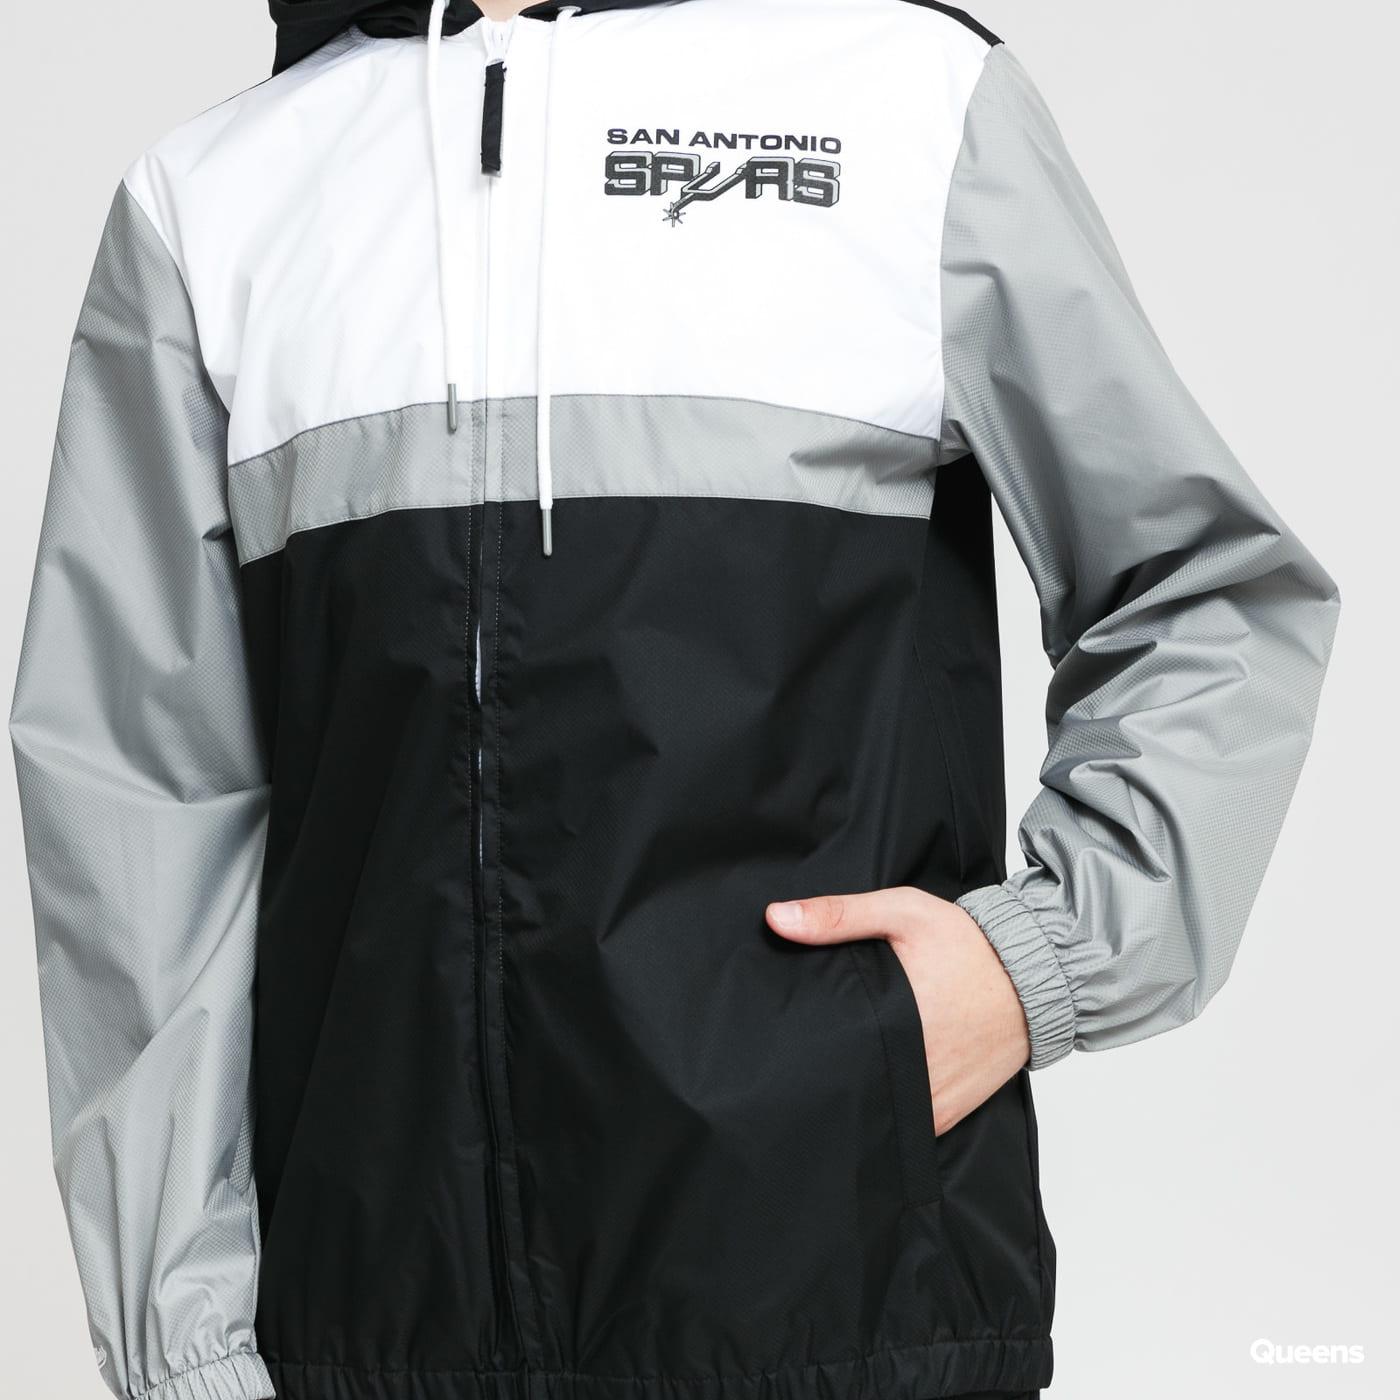 Mitchell & Ness Margin Of Victory Windbreaker San Antonio Spurs black / grey / white